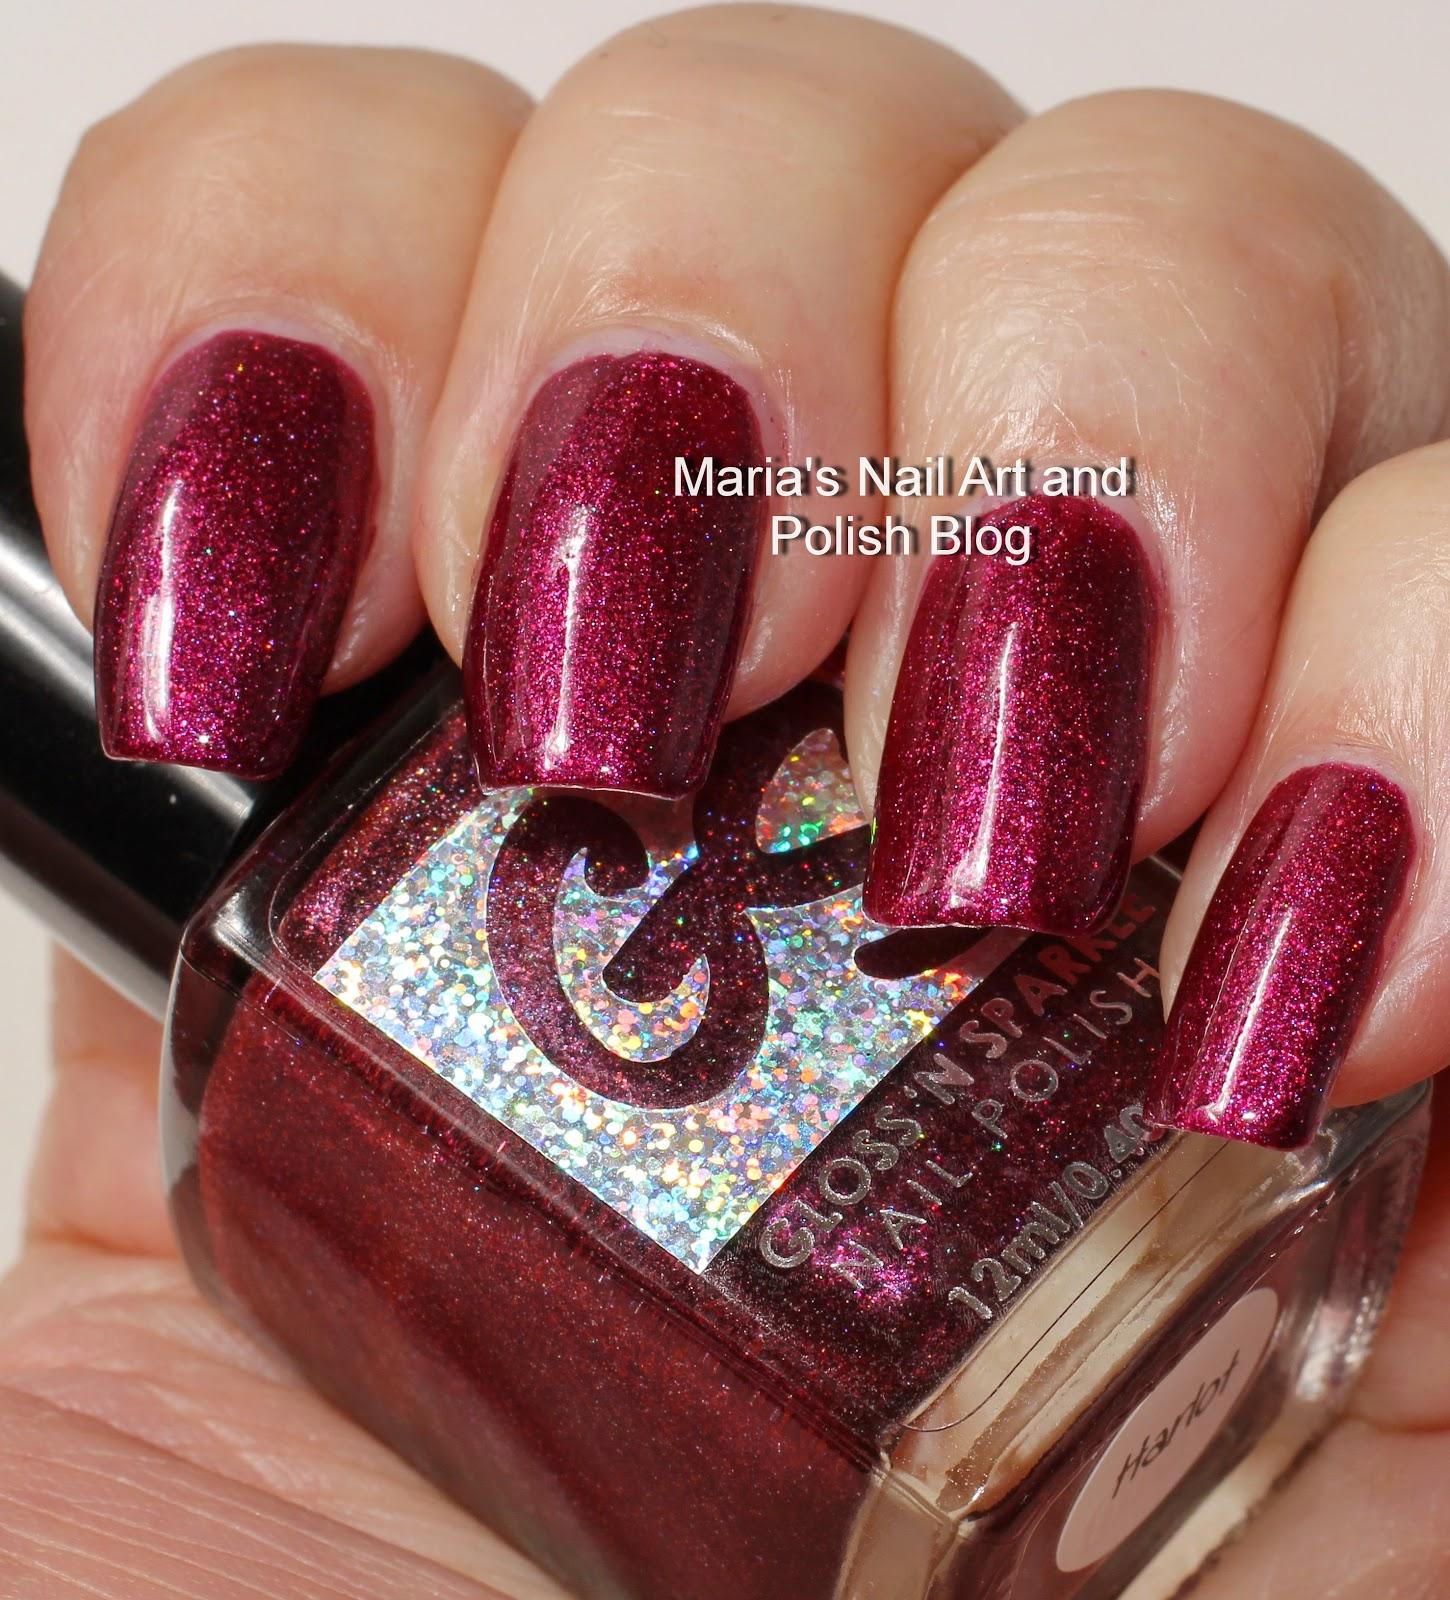 Marias Nail Art And Polish Blog Flushed With Stripes And: Marias Nail Art And Polish Blog: Gloss 'n Sparkle Harlot